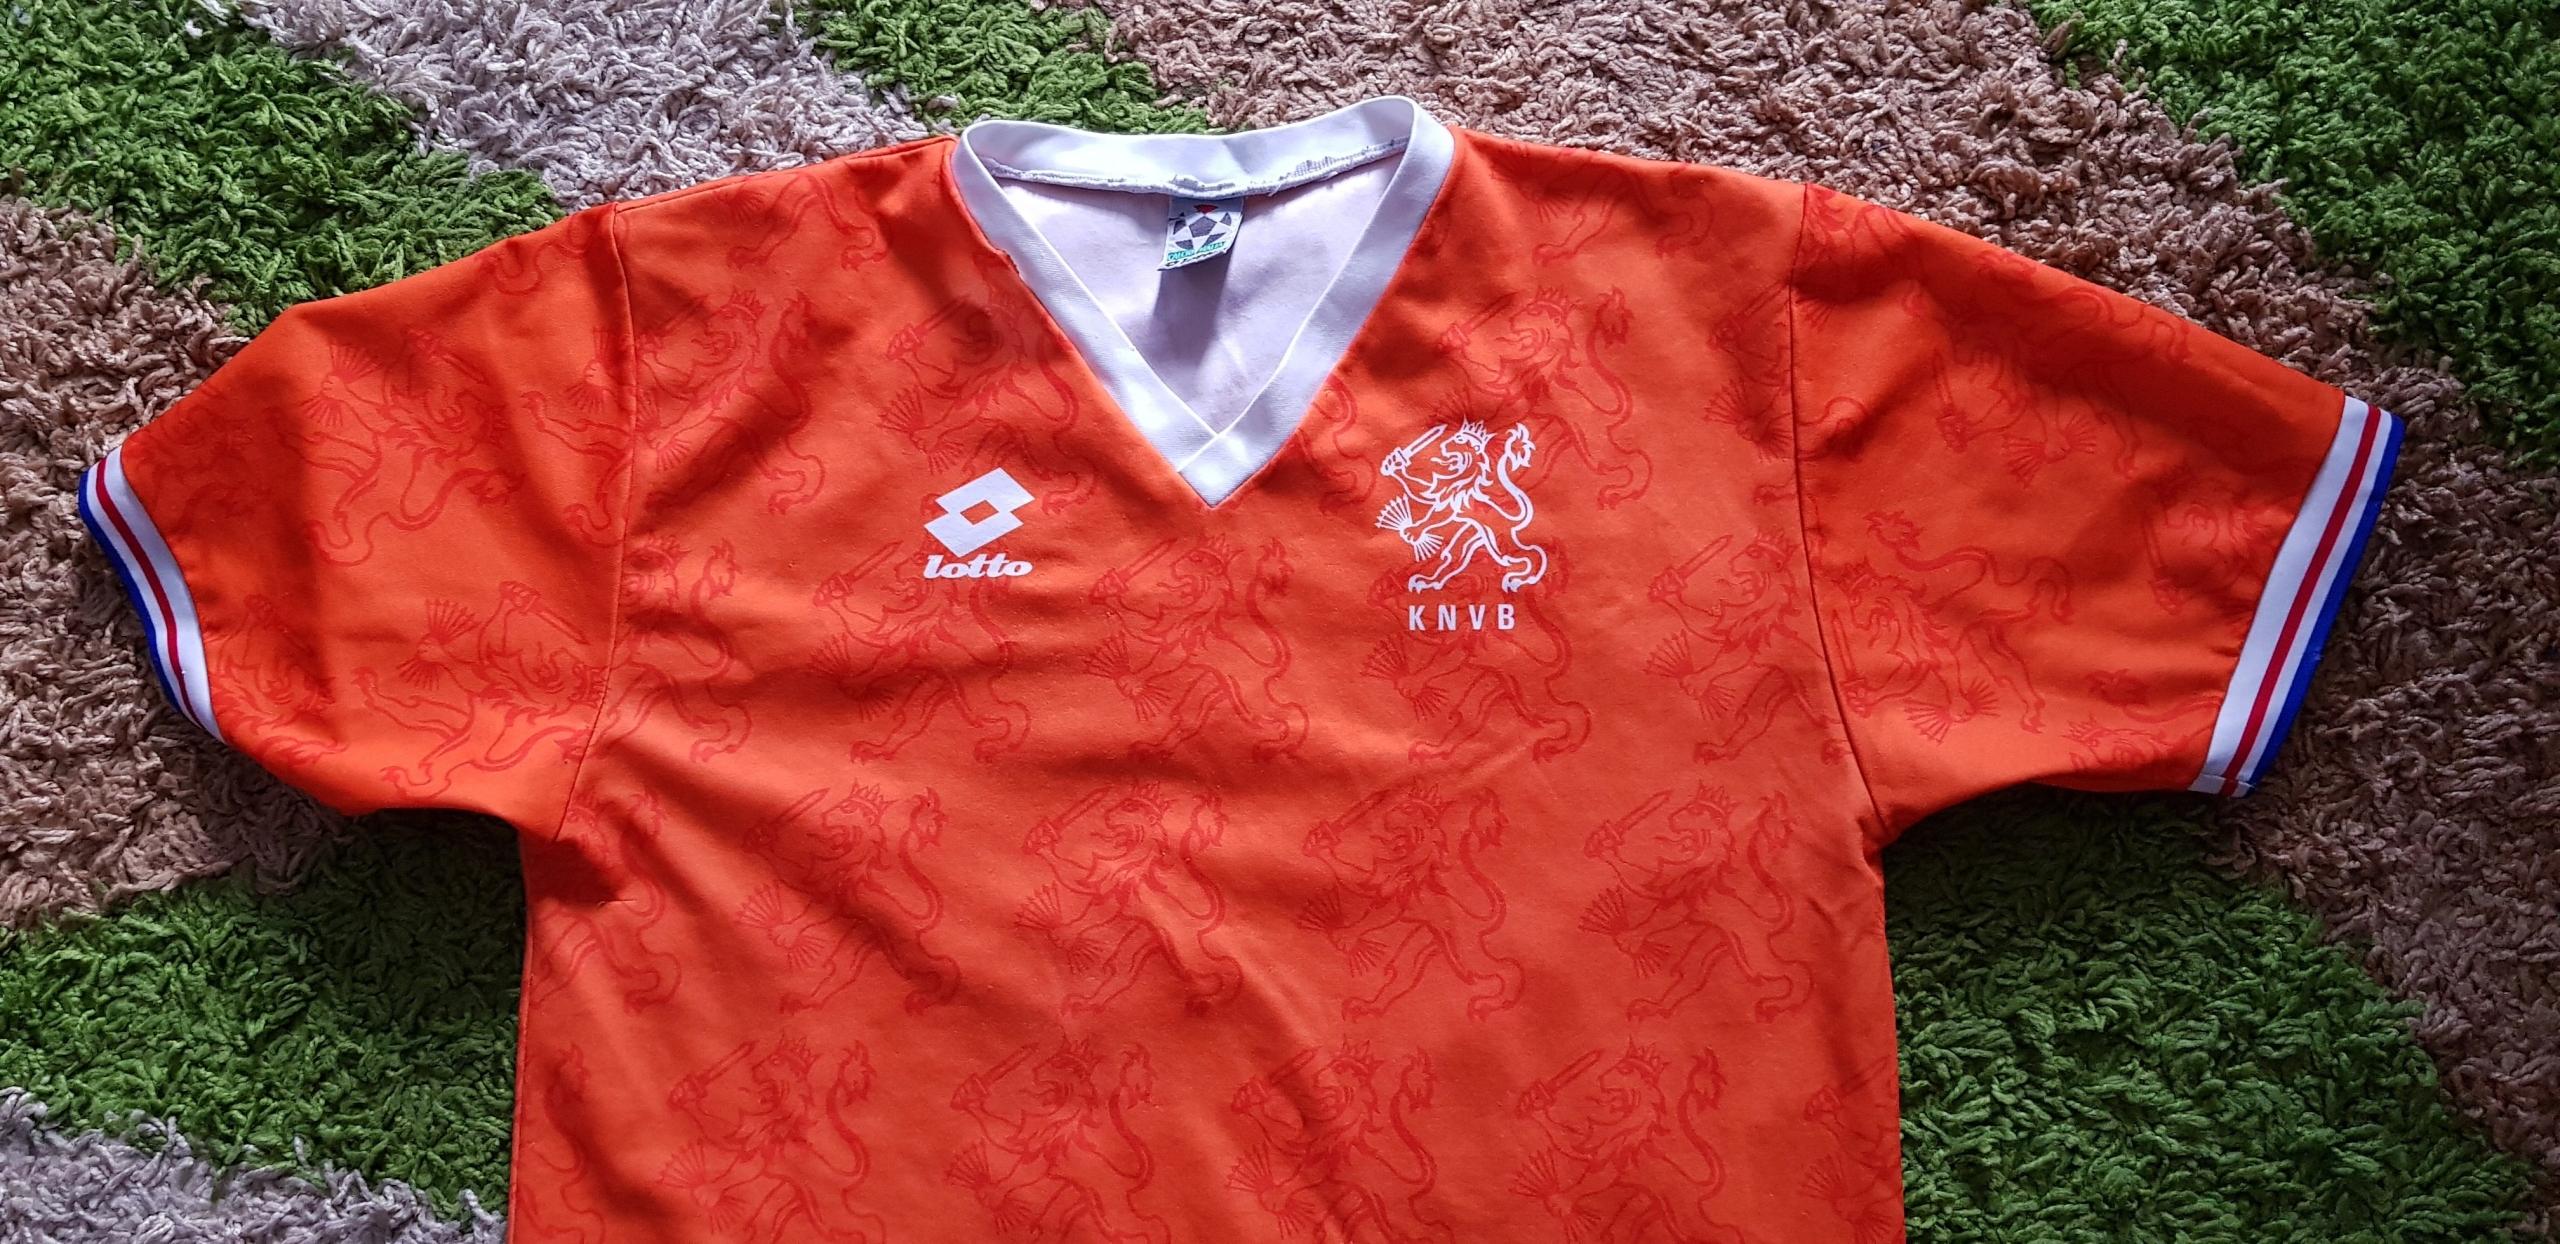 HOLANDIA KNVB LOTTO 1994